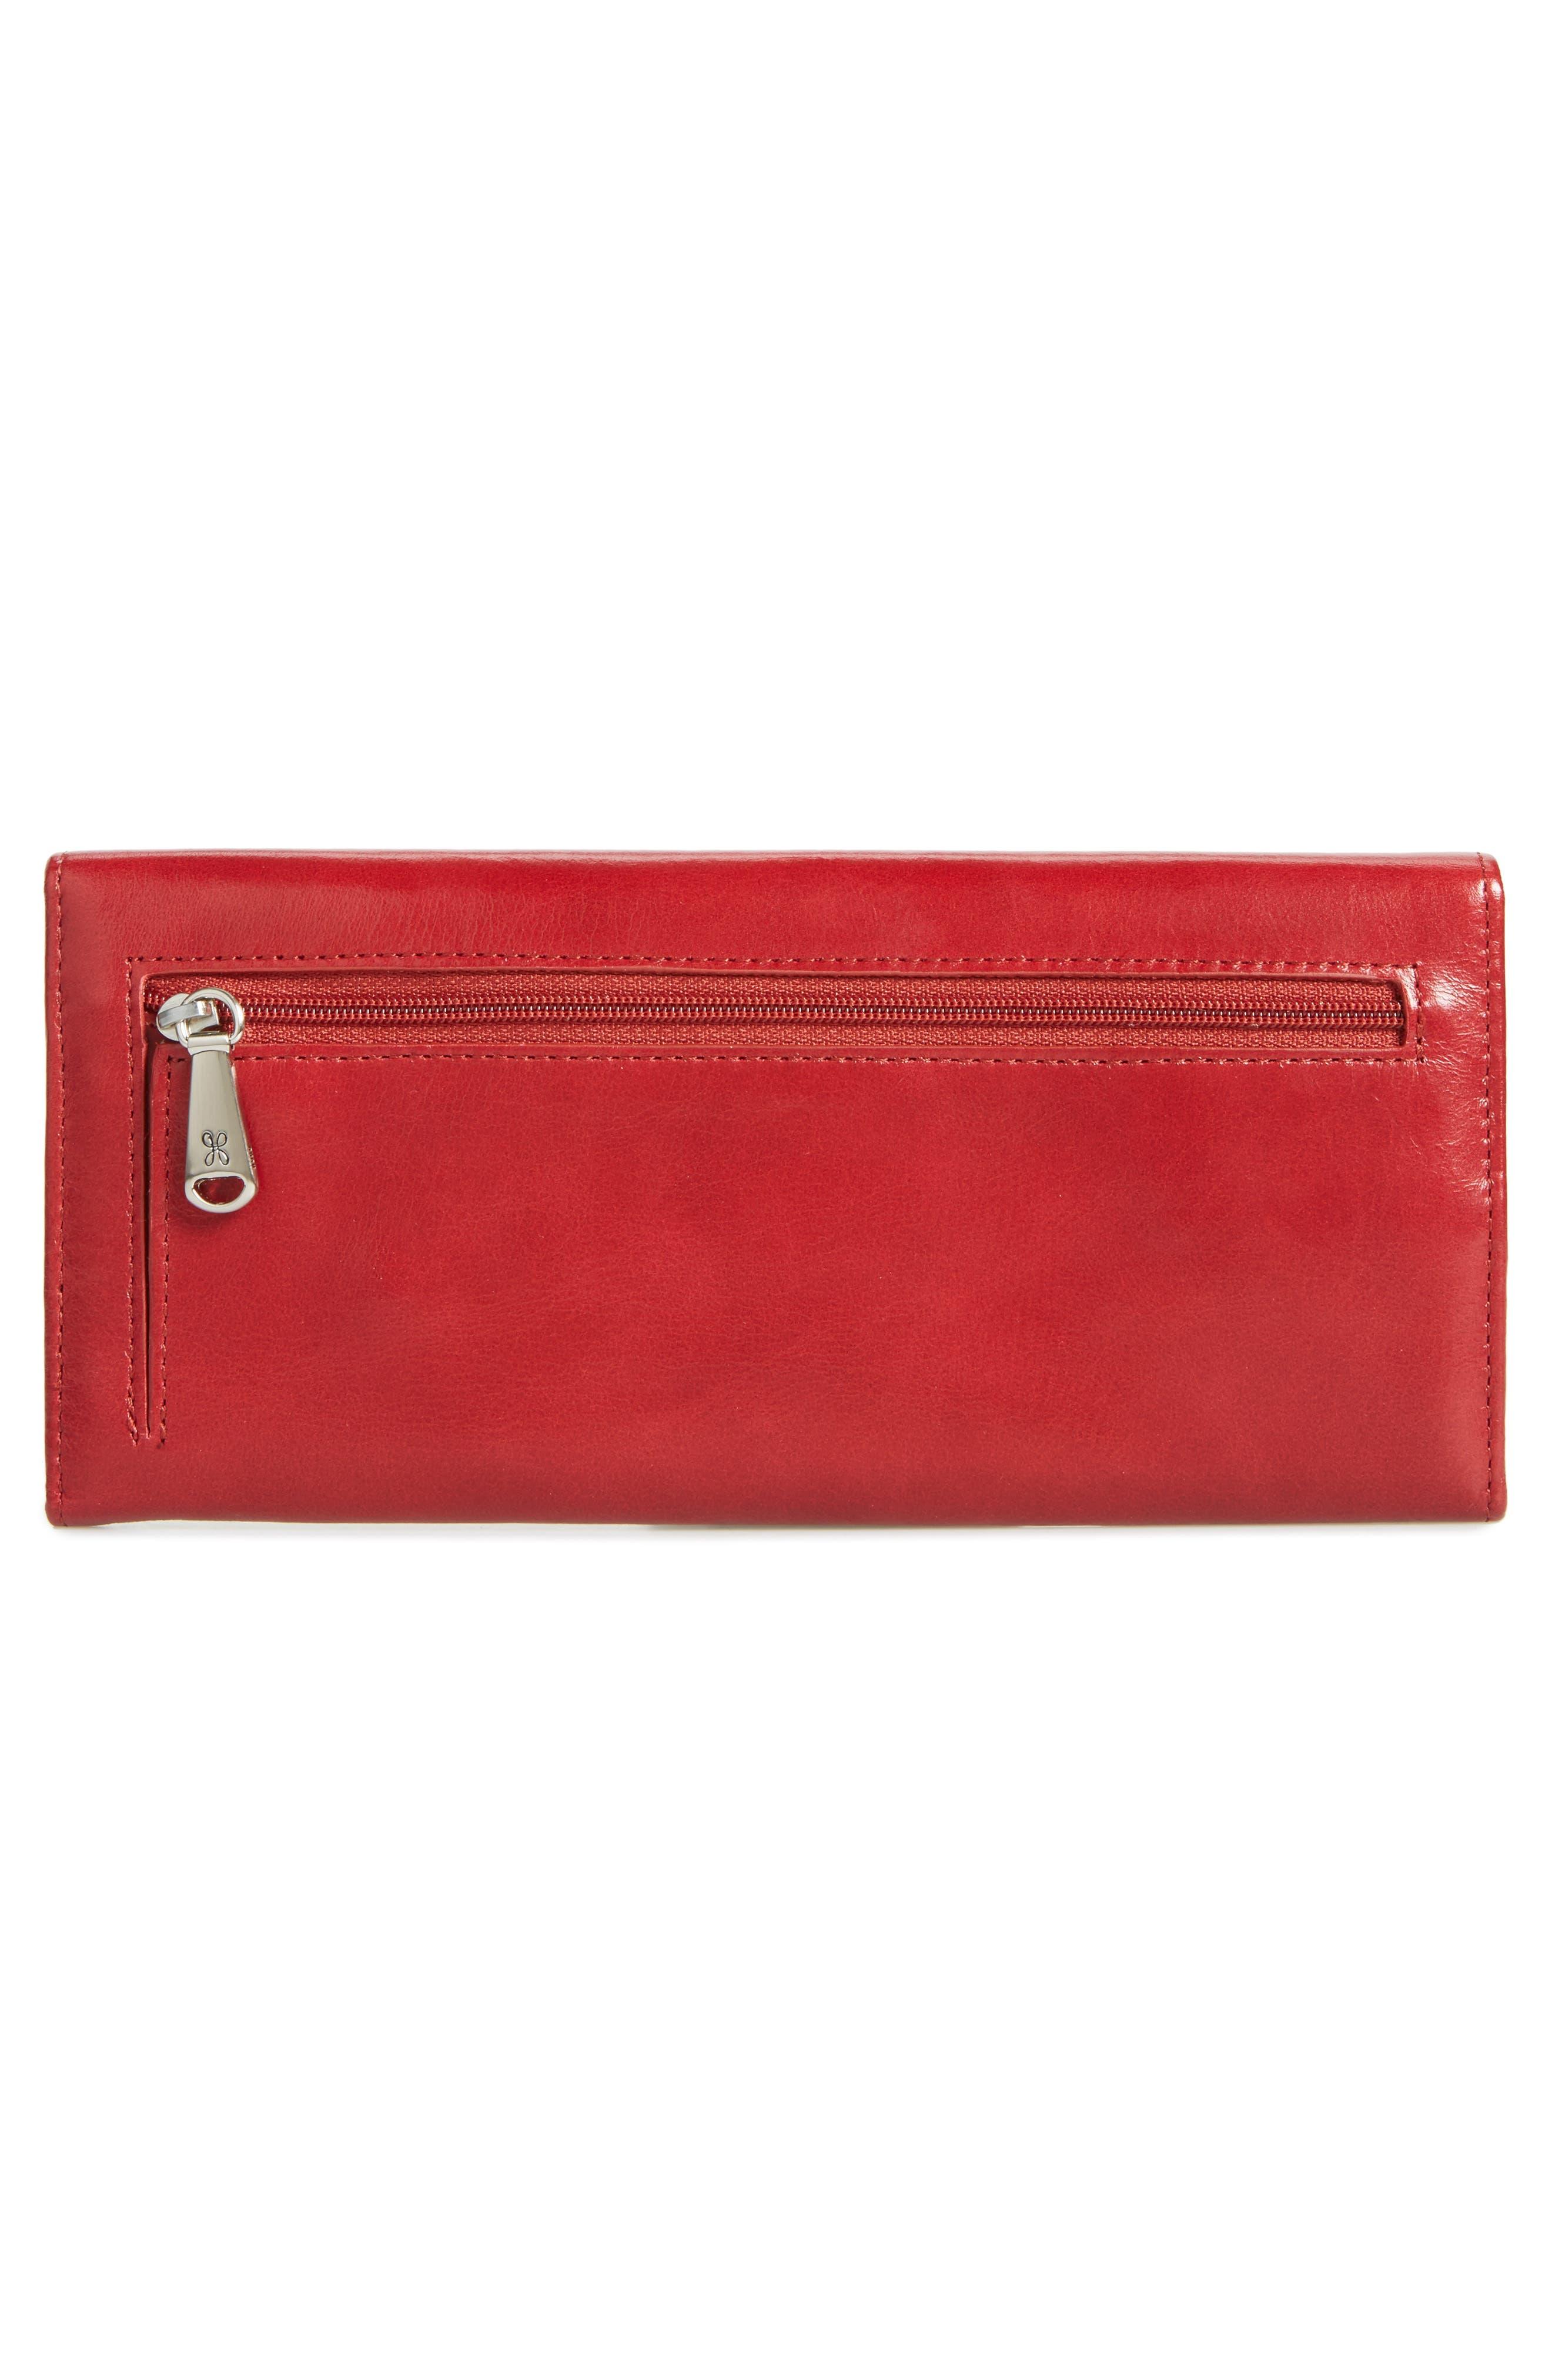 'Sadie' Leather Wallet,                             Alternate thumbnail 110, color,